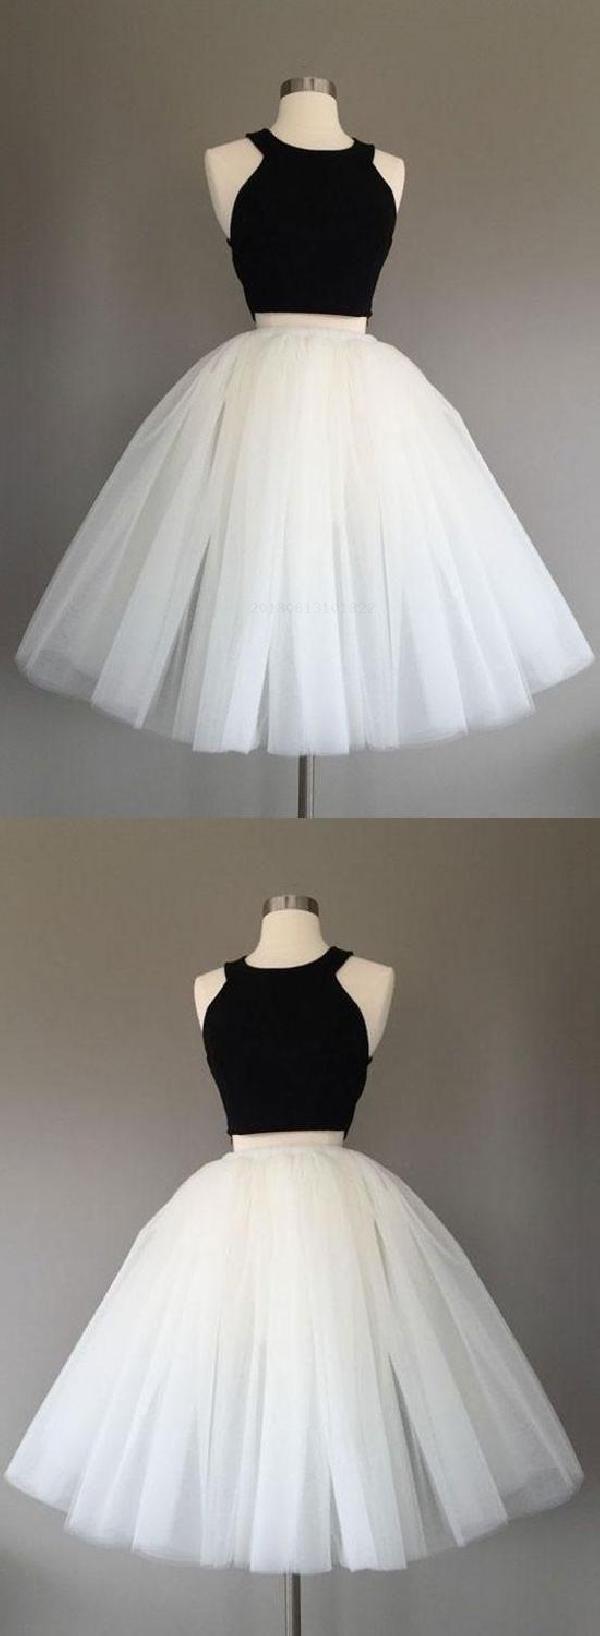 Hot sale cute black homecoming dresses homecoming dresses white